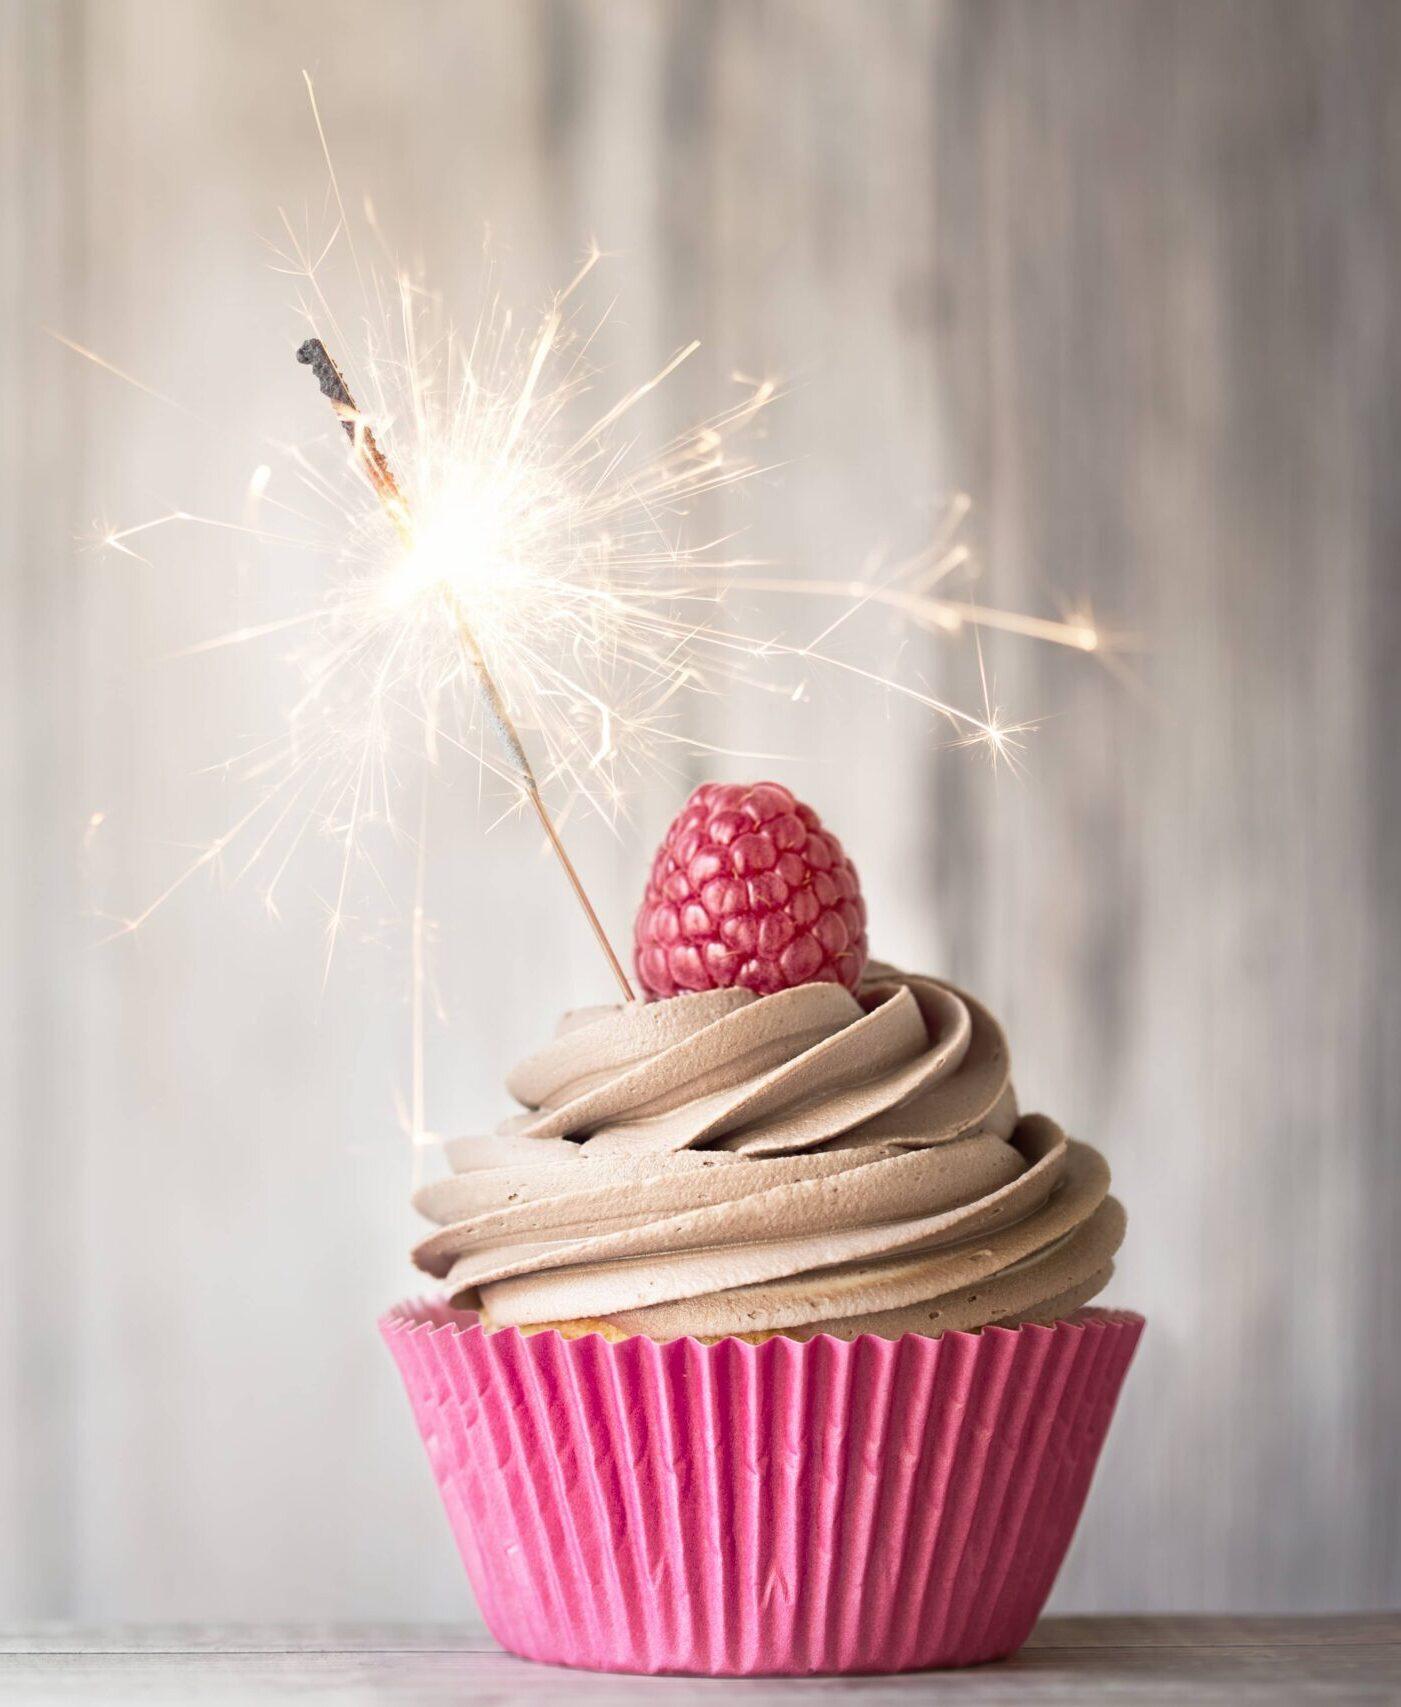 Celebration-cupcake-PQF44L8 (1)